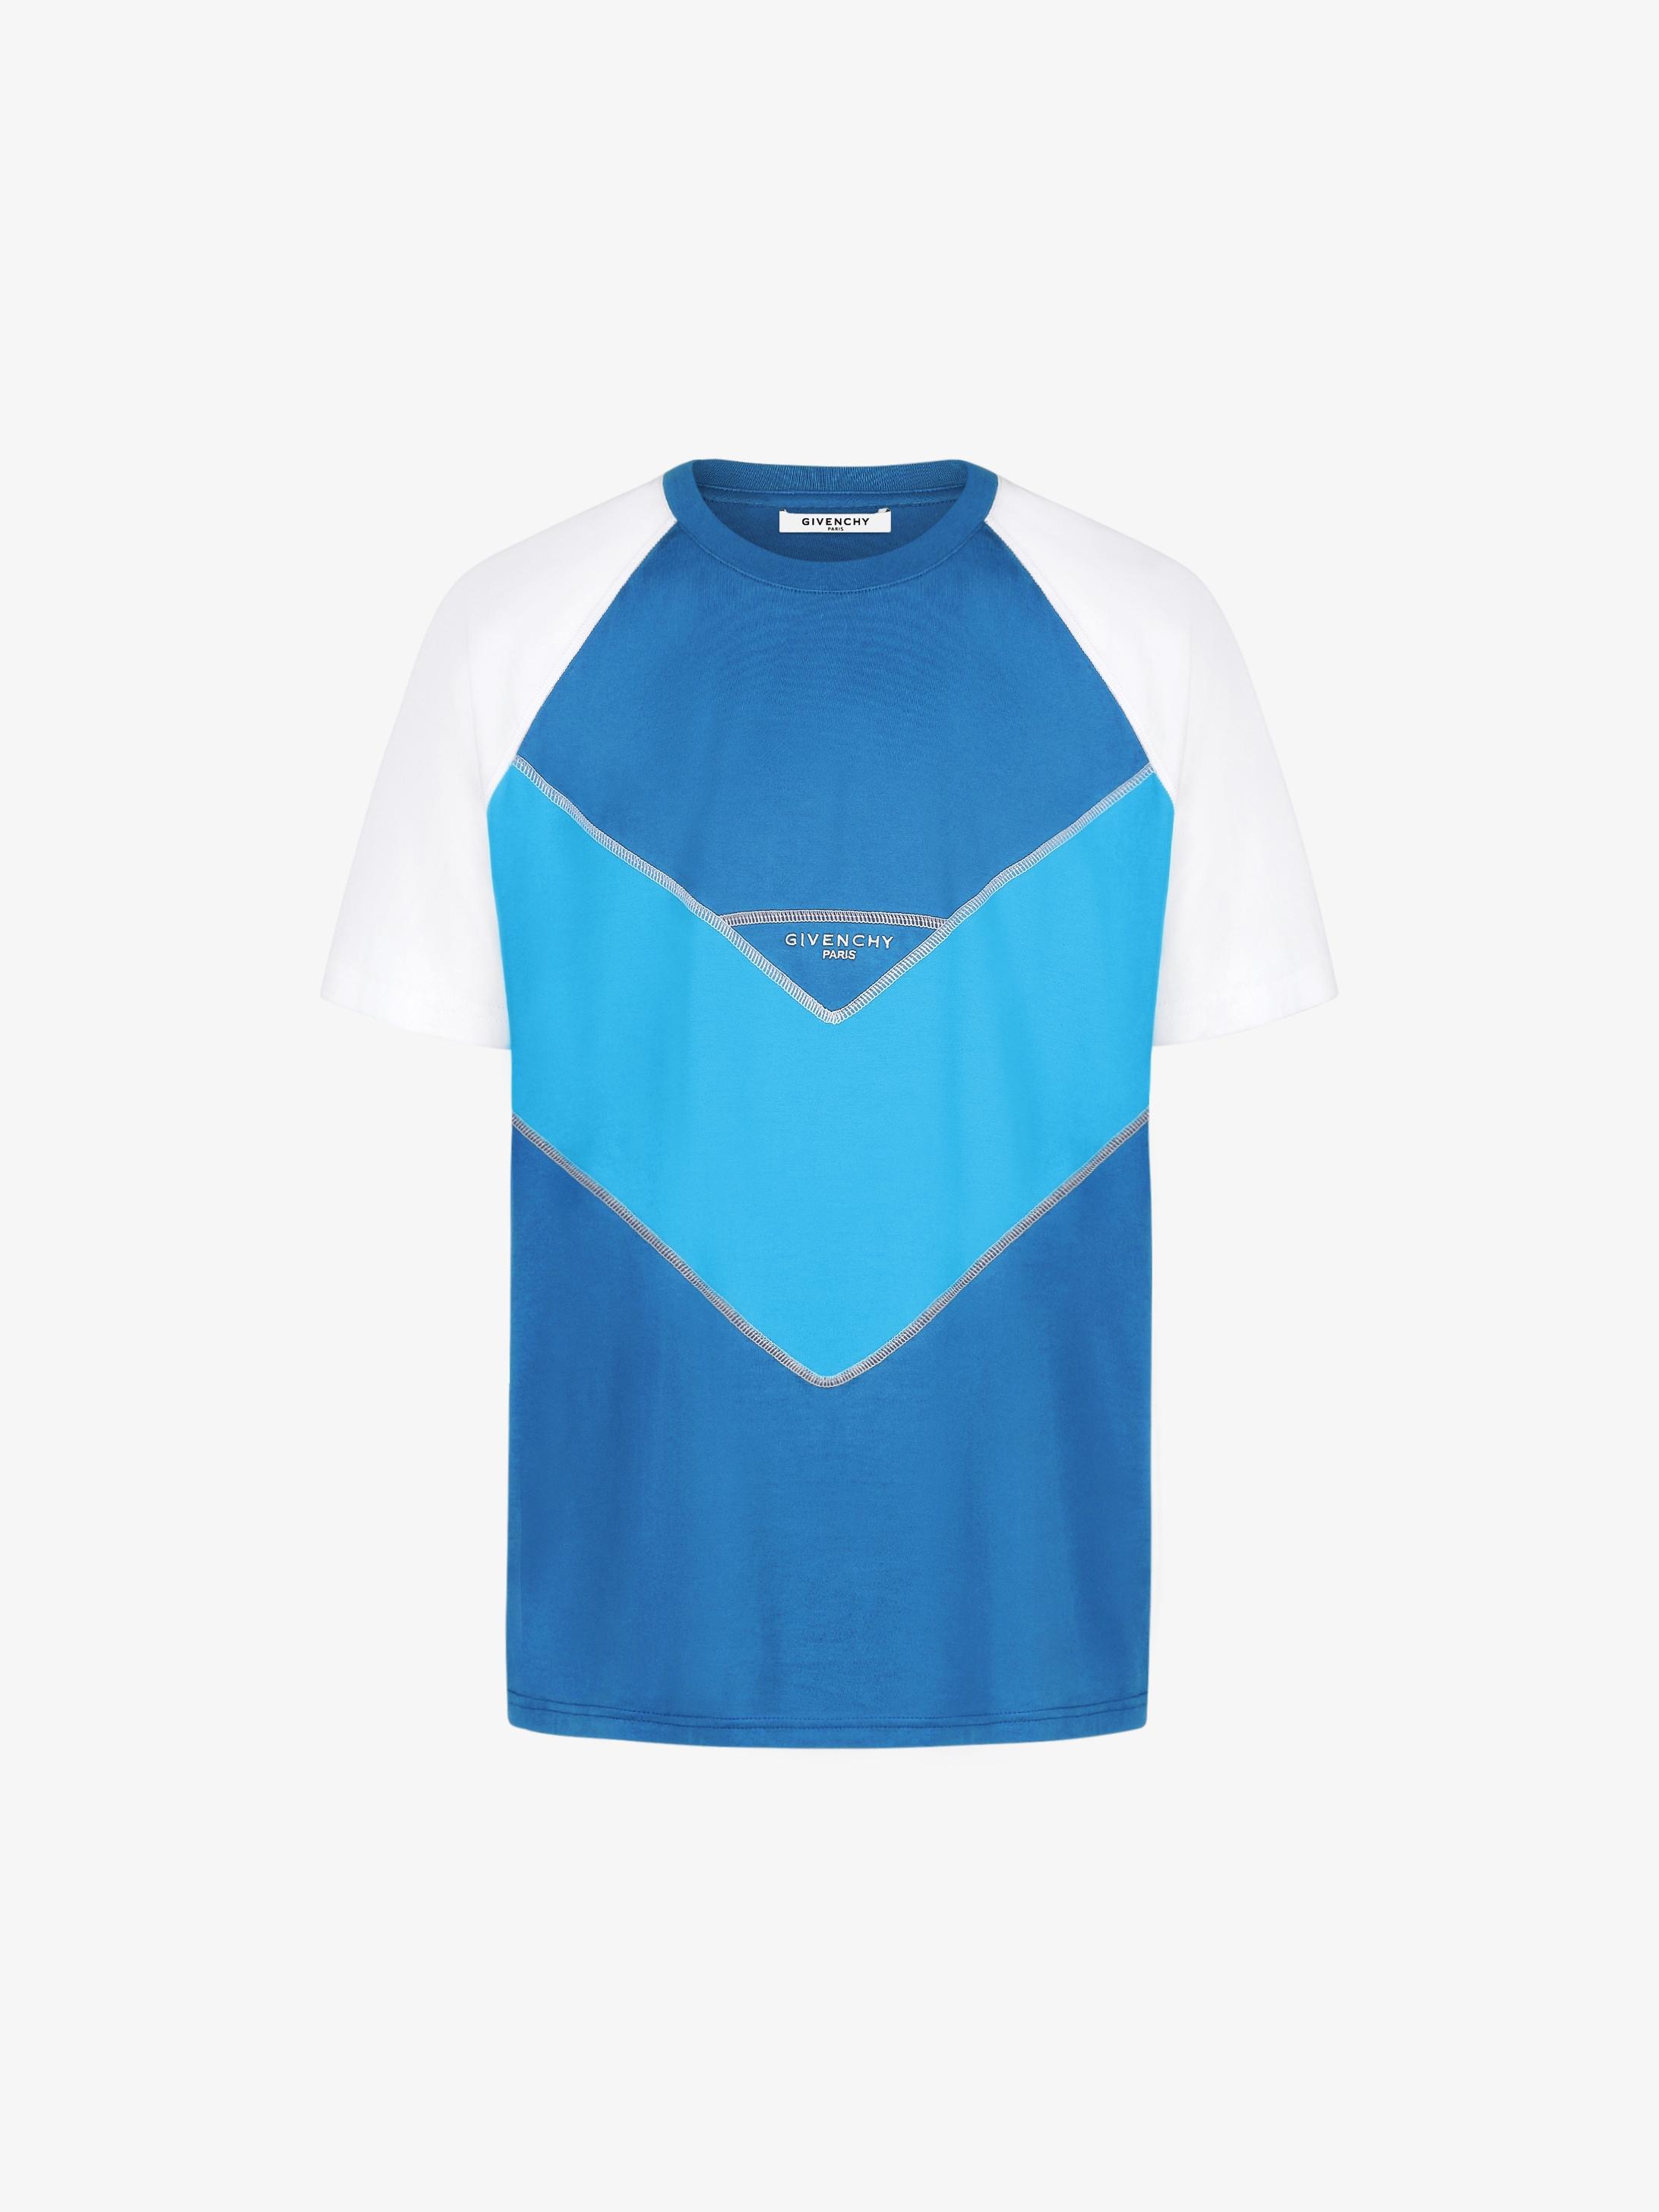 GIVENCHY PARIS  three tone contrasting stitching T-shirt